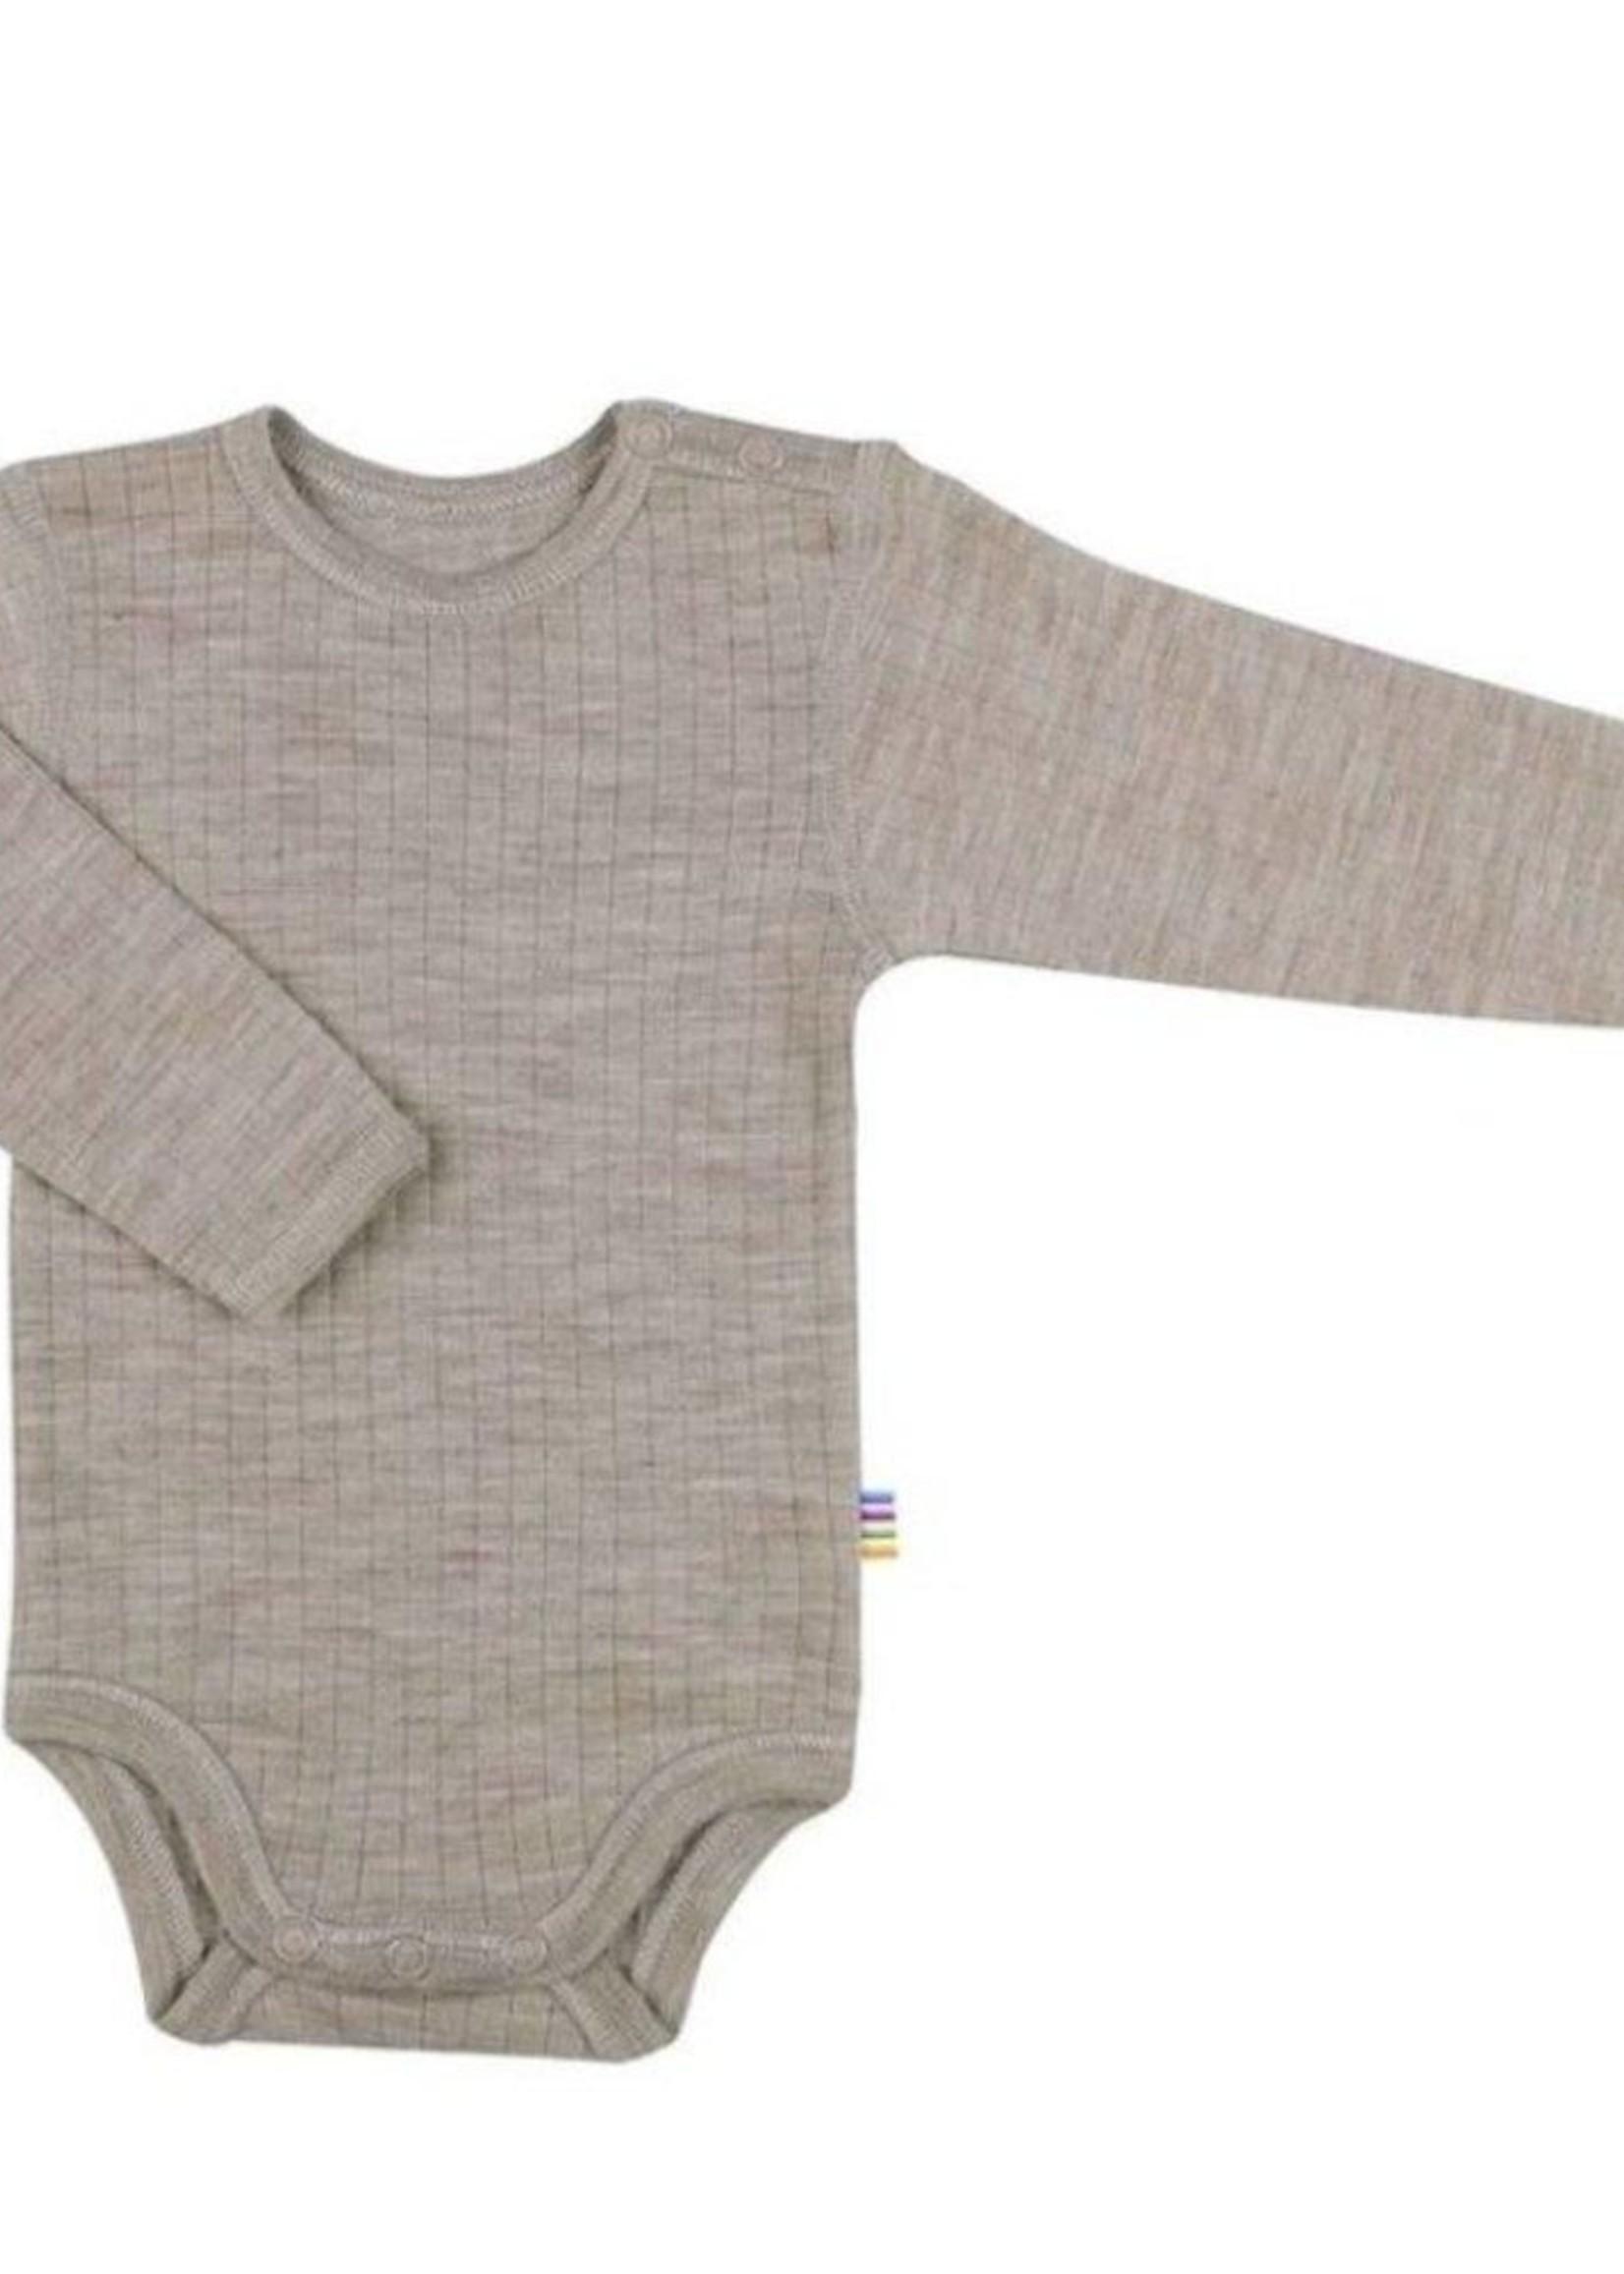 Joha Body Long Sleeve - 100% Wool - Sesame Melange